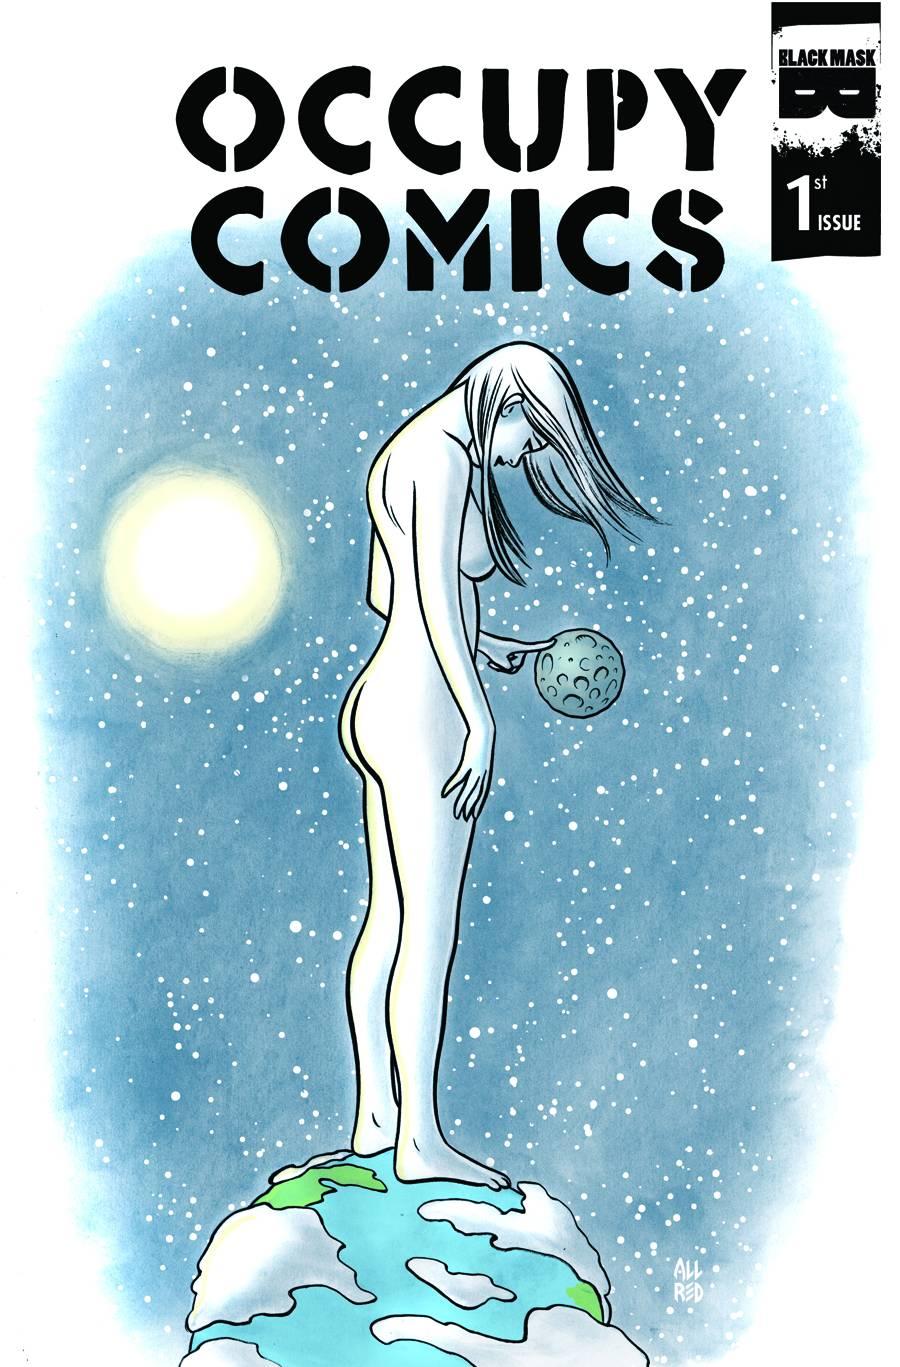 occupycomics#1